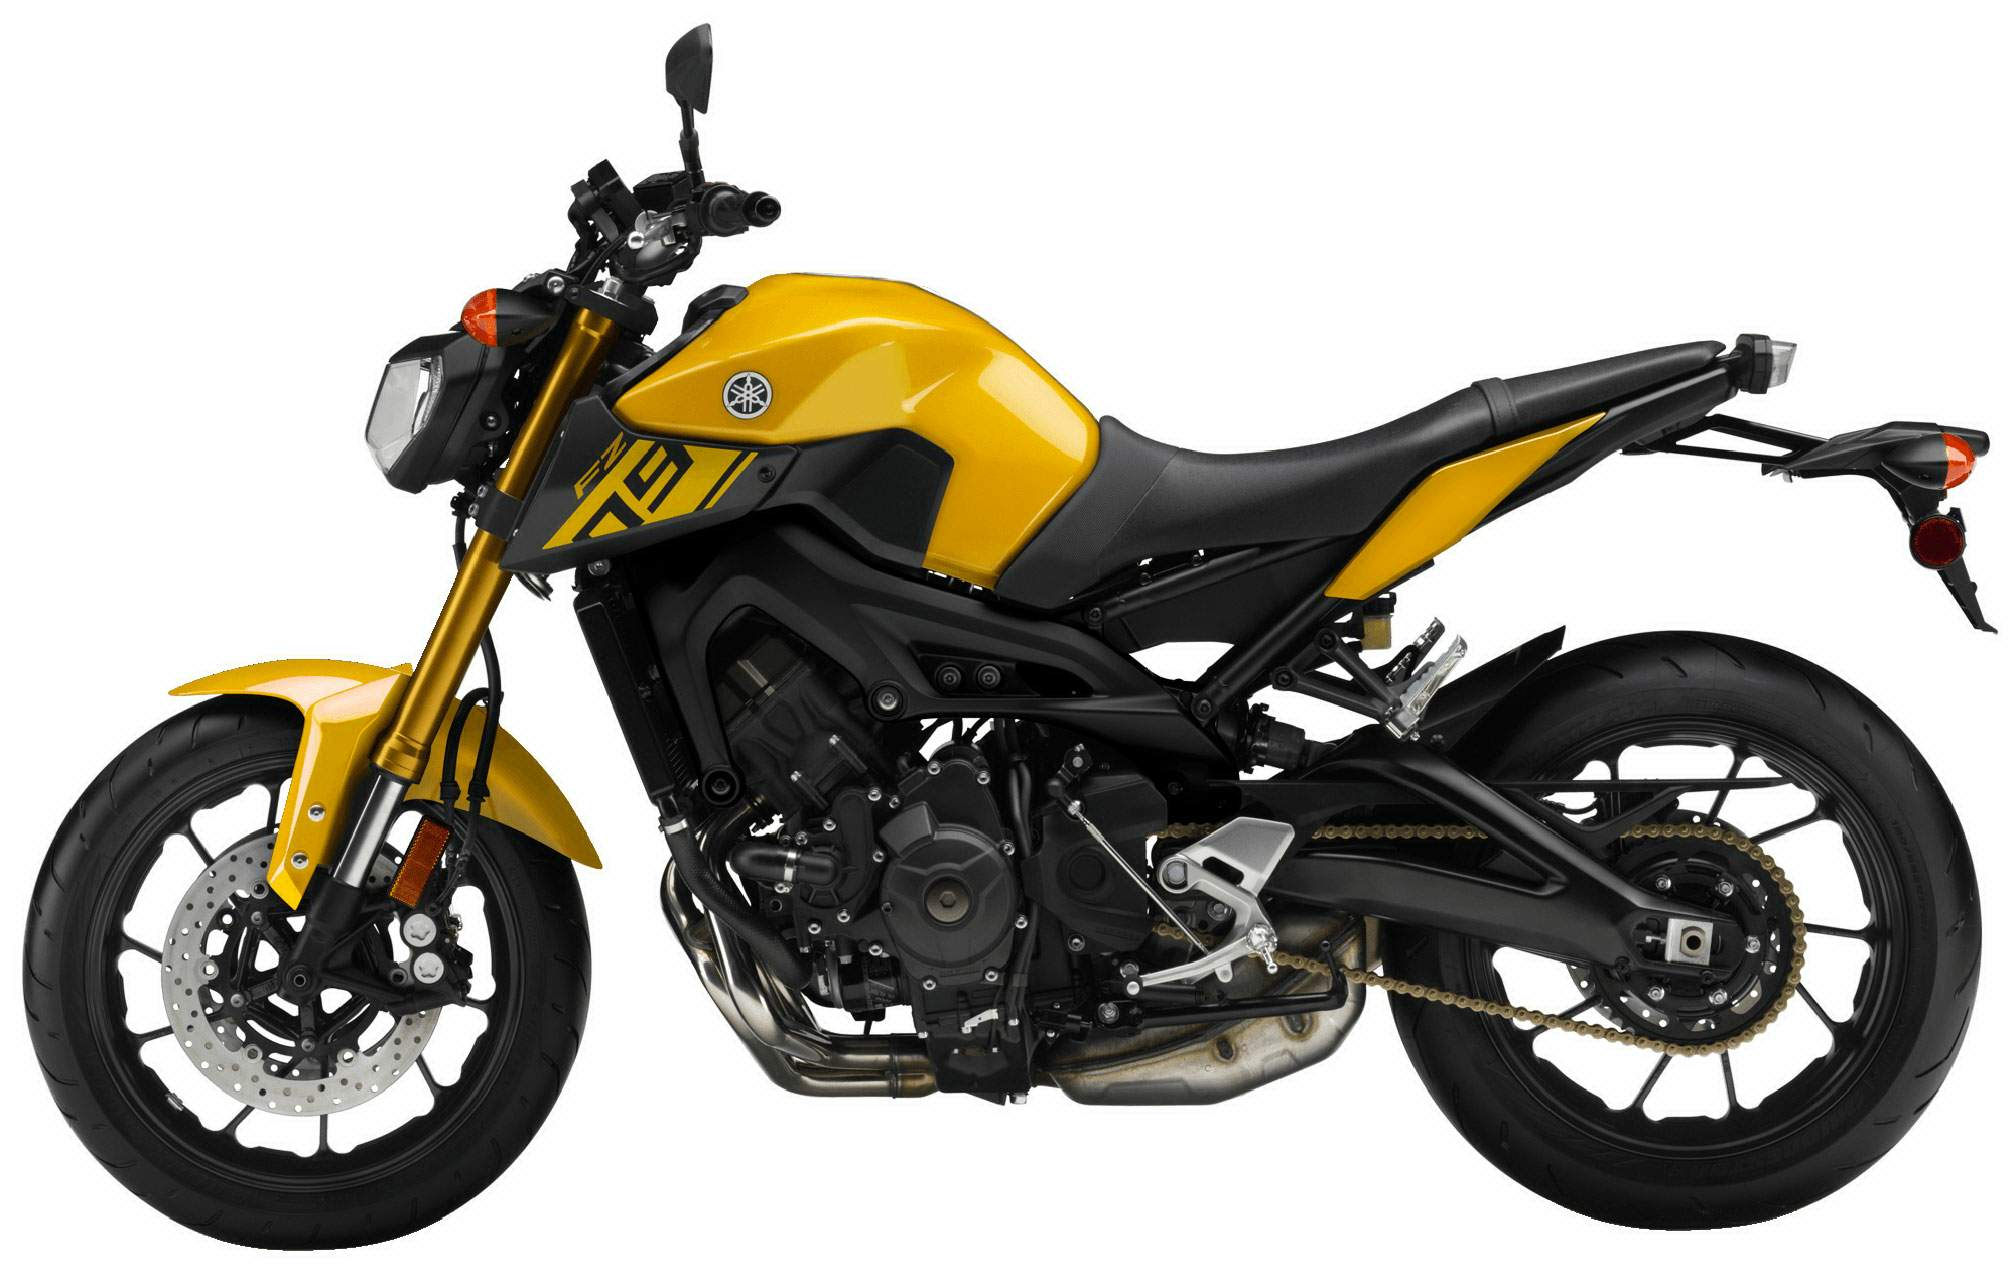 Yamaha Mt 09 Specs 2013 2014 2015 2016 2017